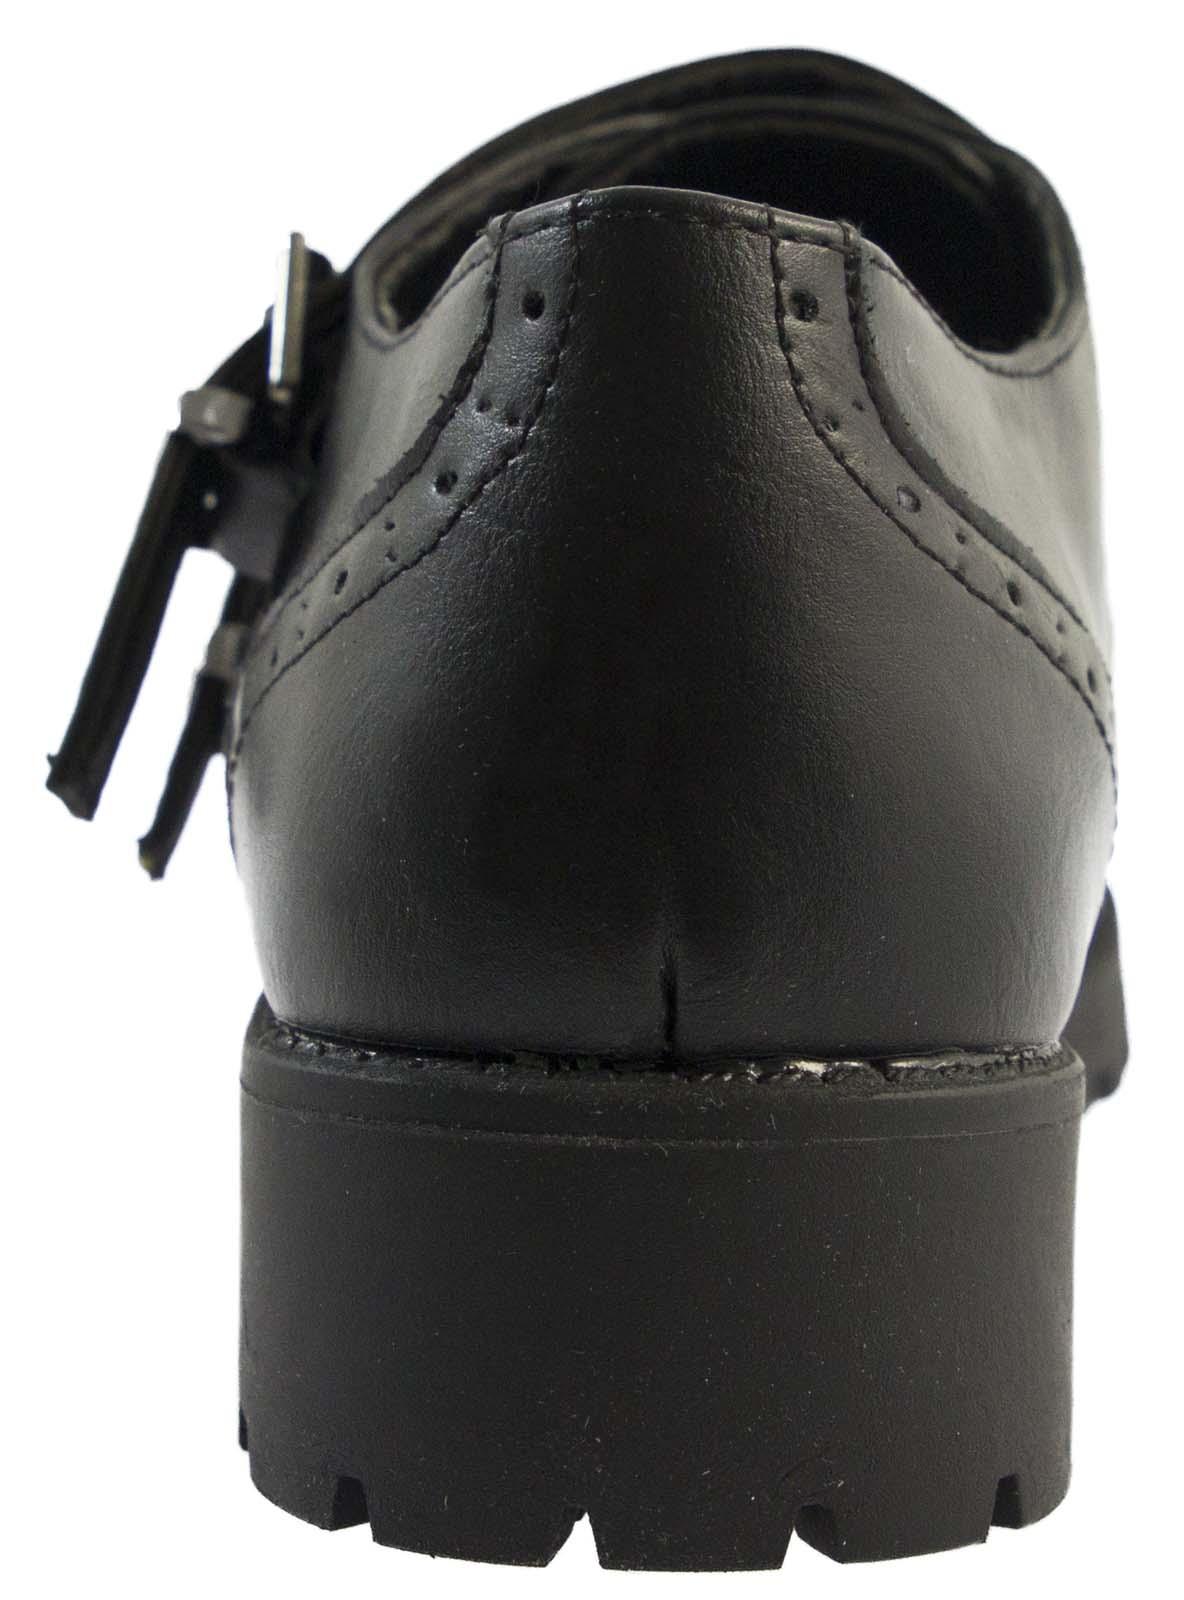 49e0e446e860 Womens Chunky Sole Work Shoes Girls School Shoes Faux Leather ...